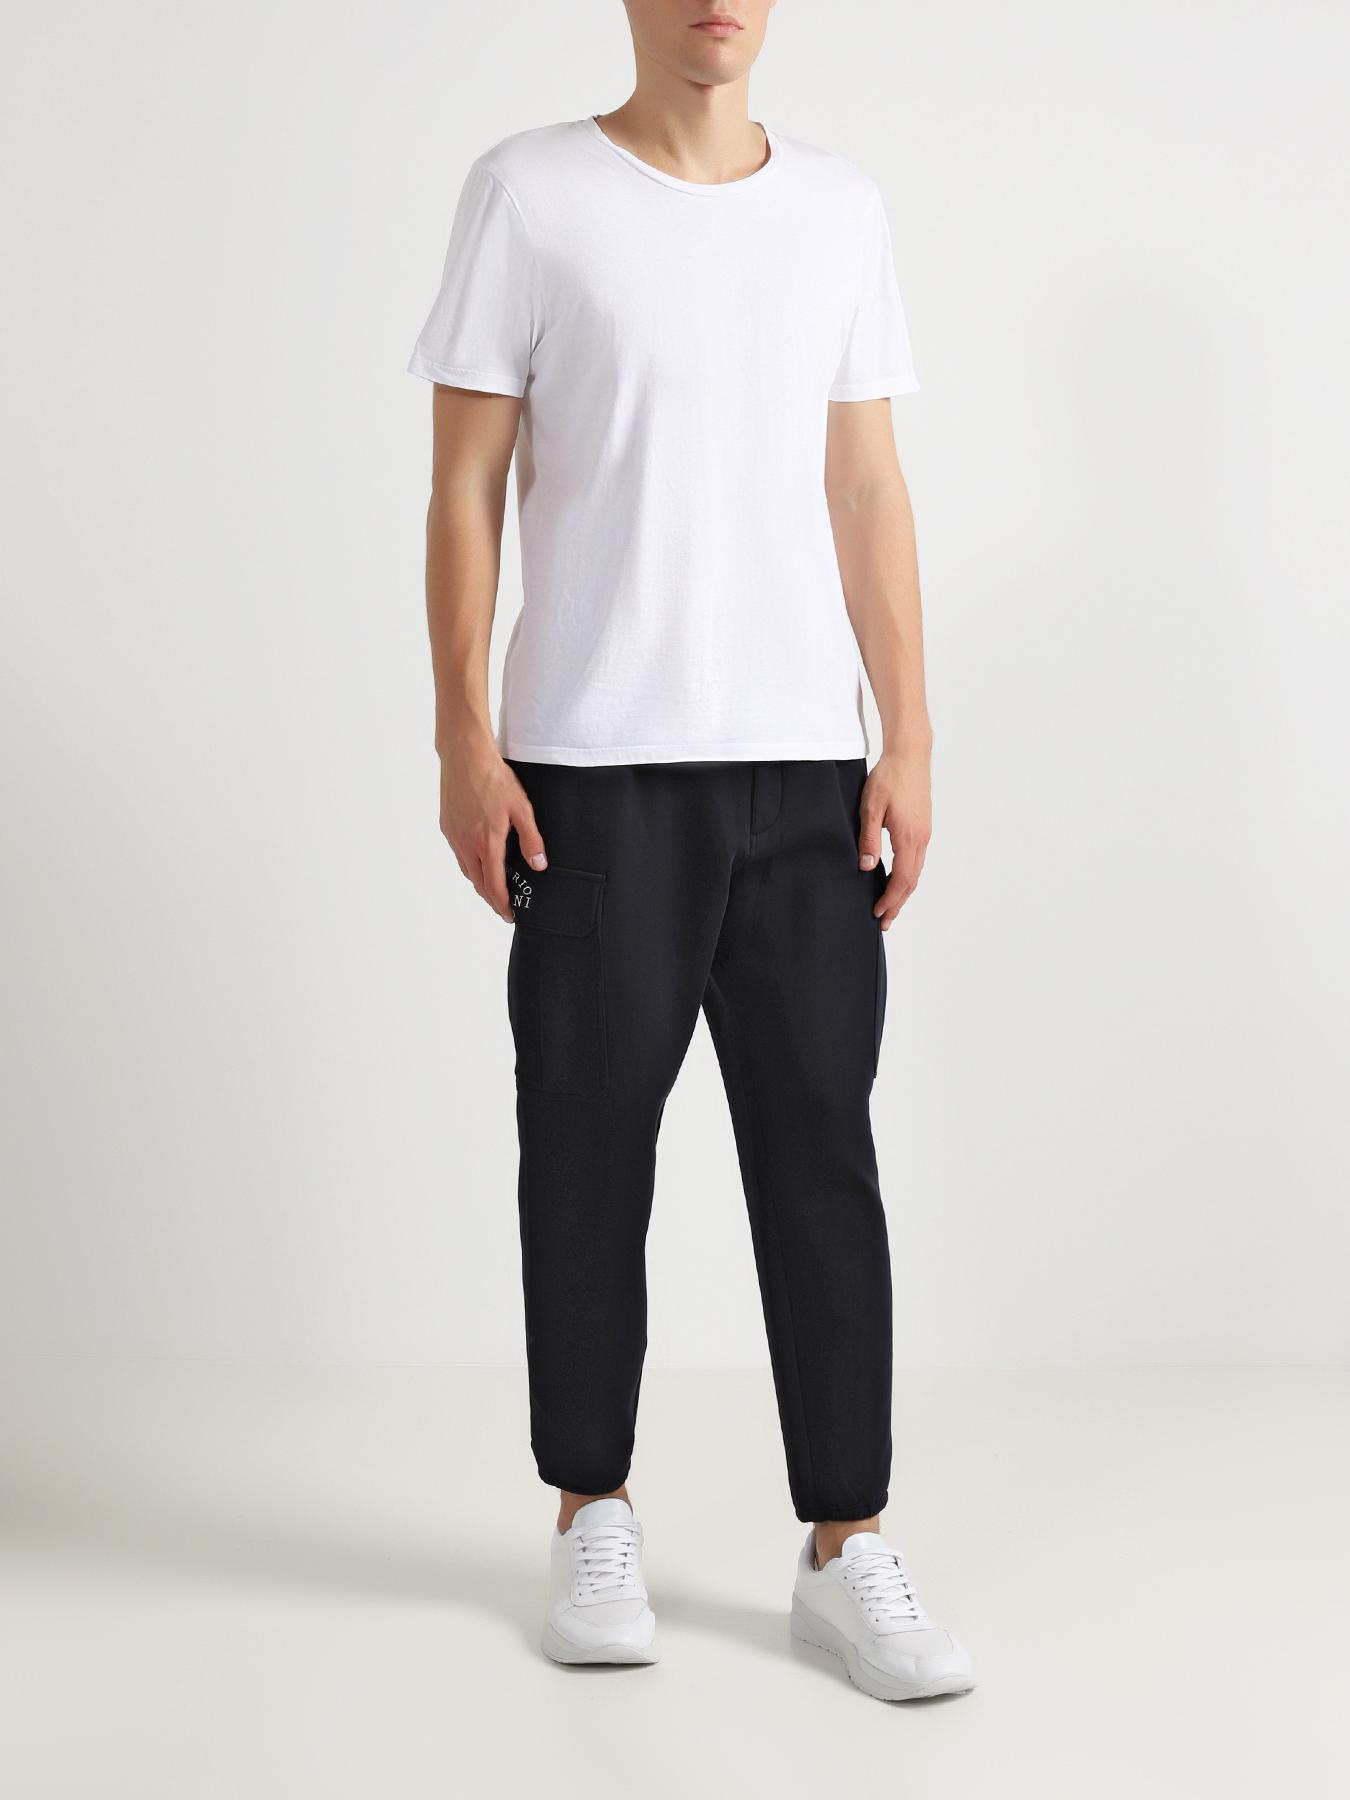 Брюки Emporio Armani Спортивные брюки брюки спортивные columbia columbia anytime outdoor boot cut pant